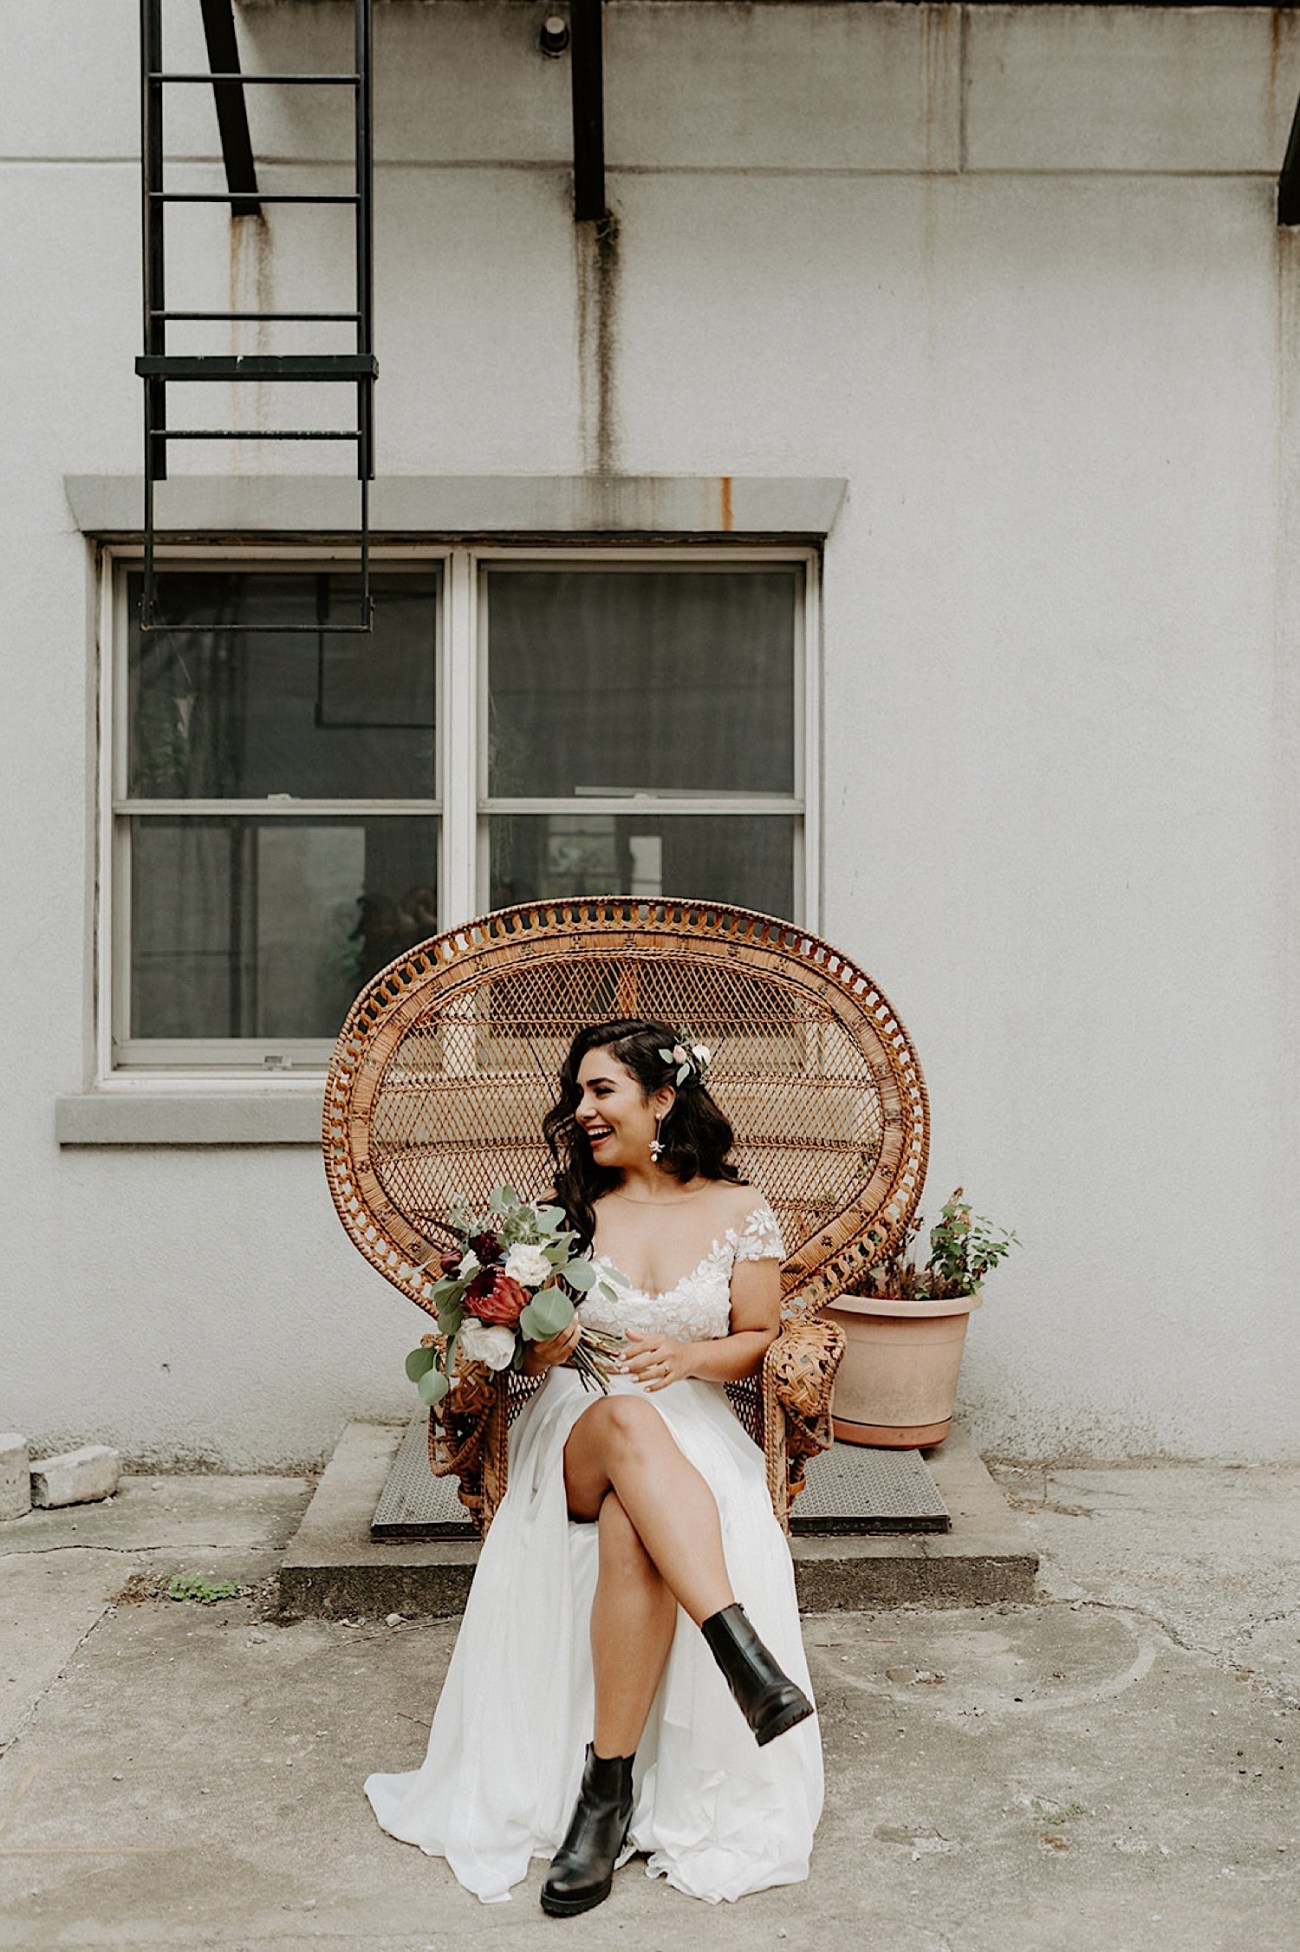 026 Brooklyn Dumbo Elopement Brooklyn Wedding Photographer NYC Wedding Destination Elopement